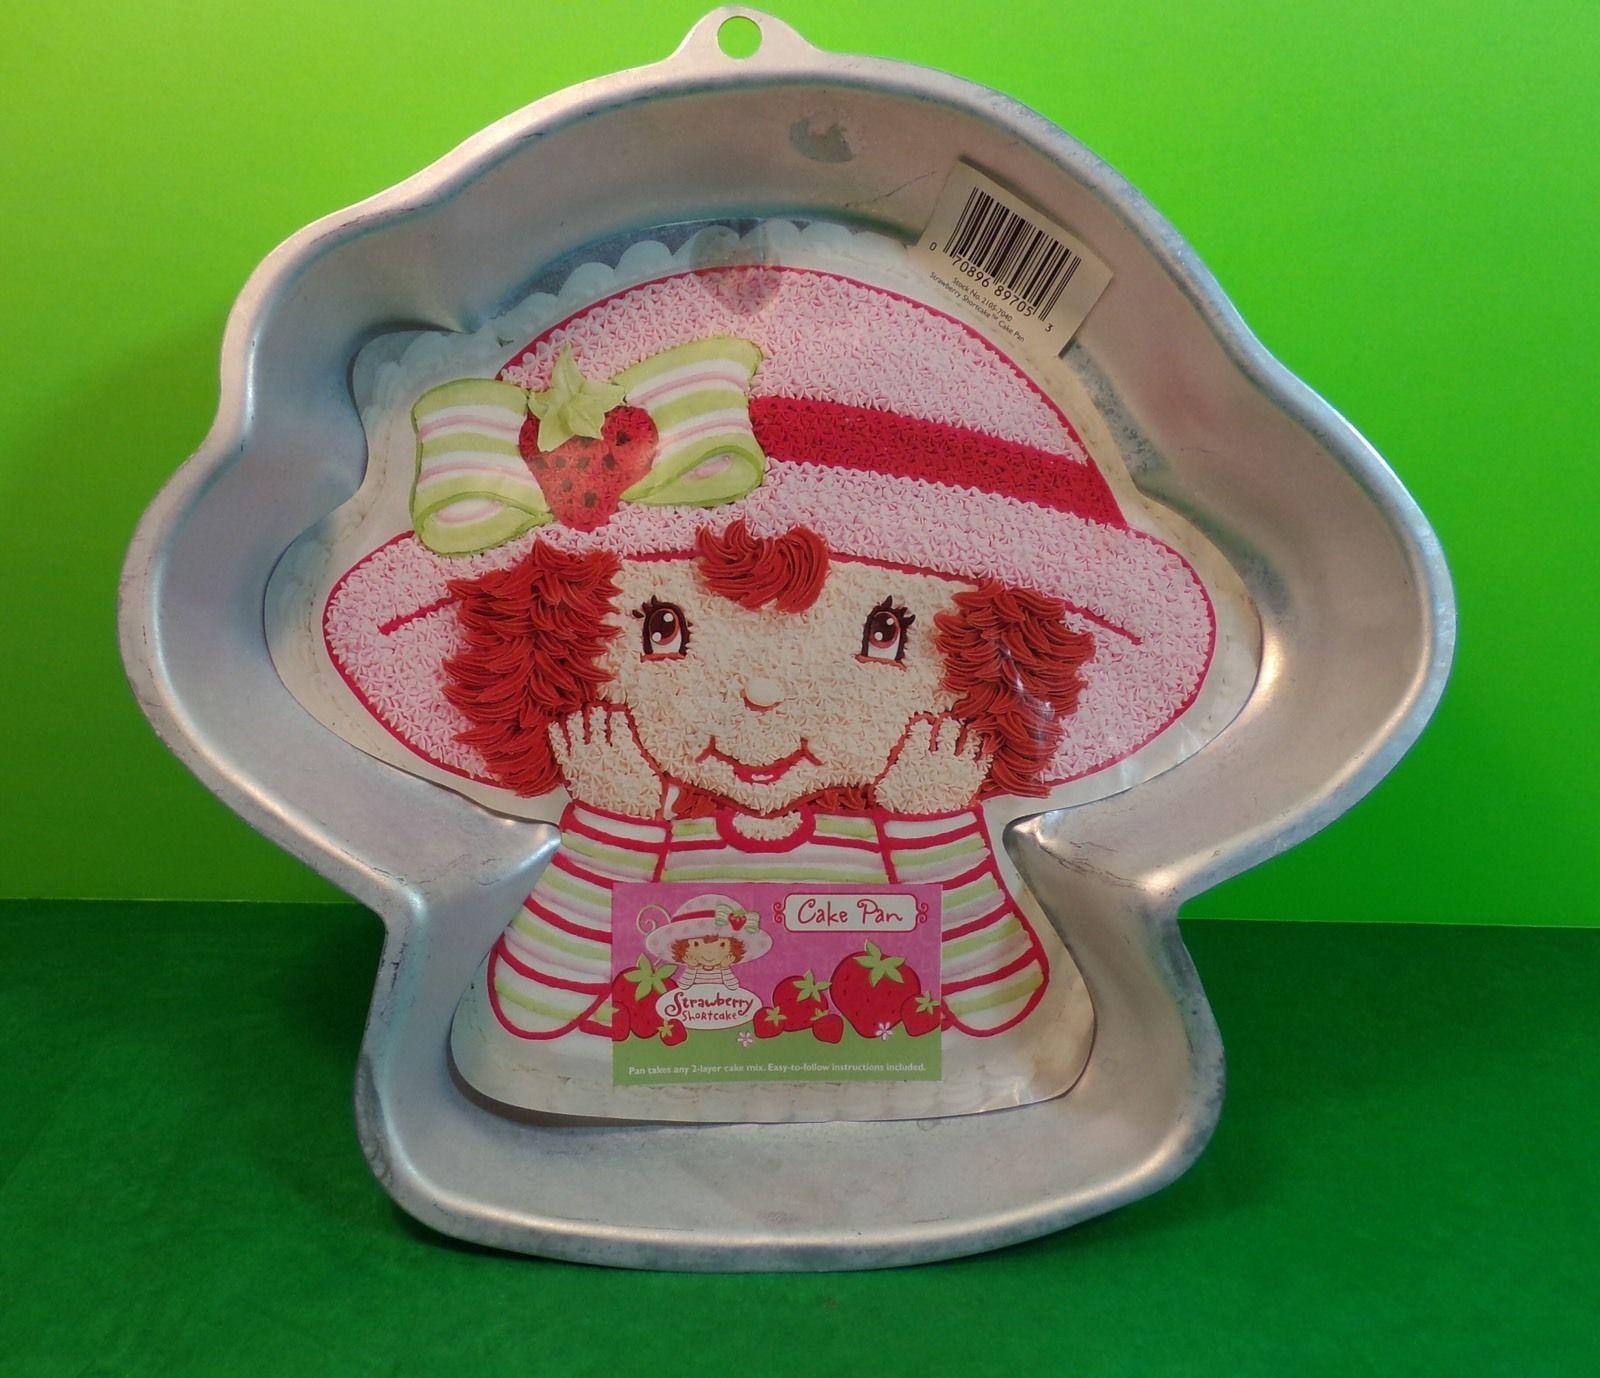 2003 Wilton Strawberry Shortcake Character Cake Pan With Insert Birthday - $7.70